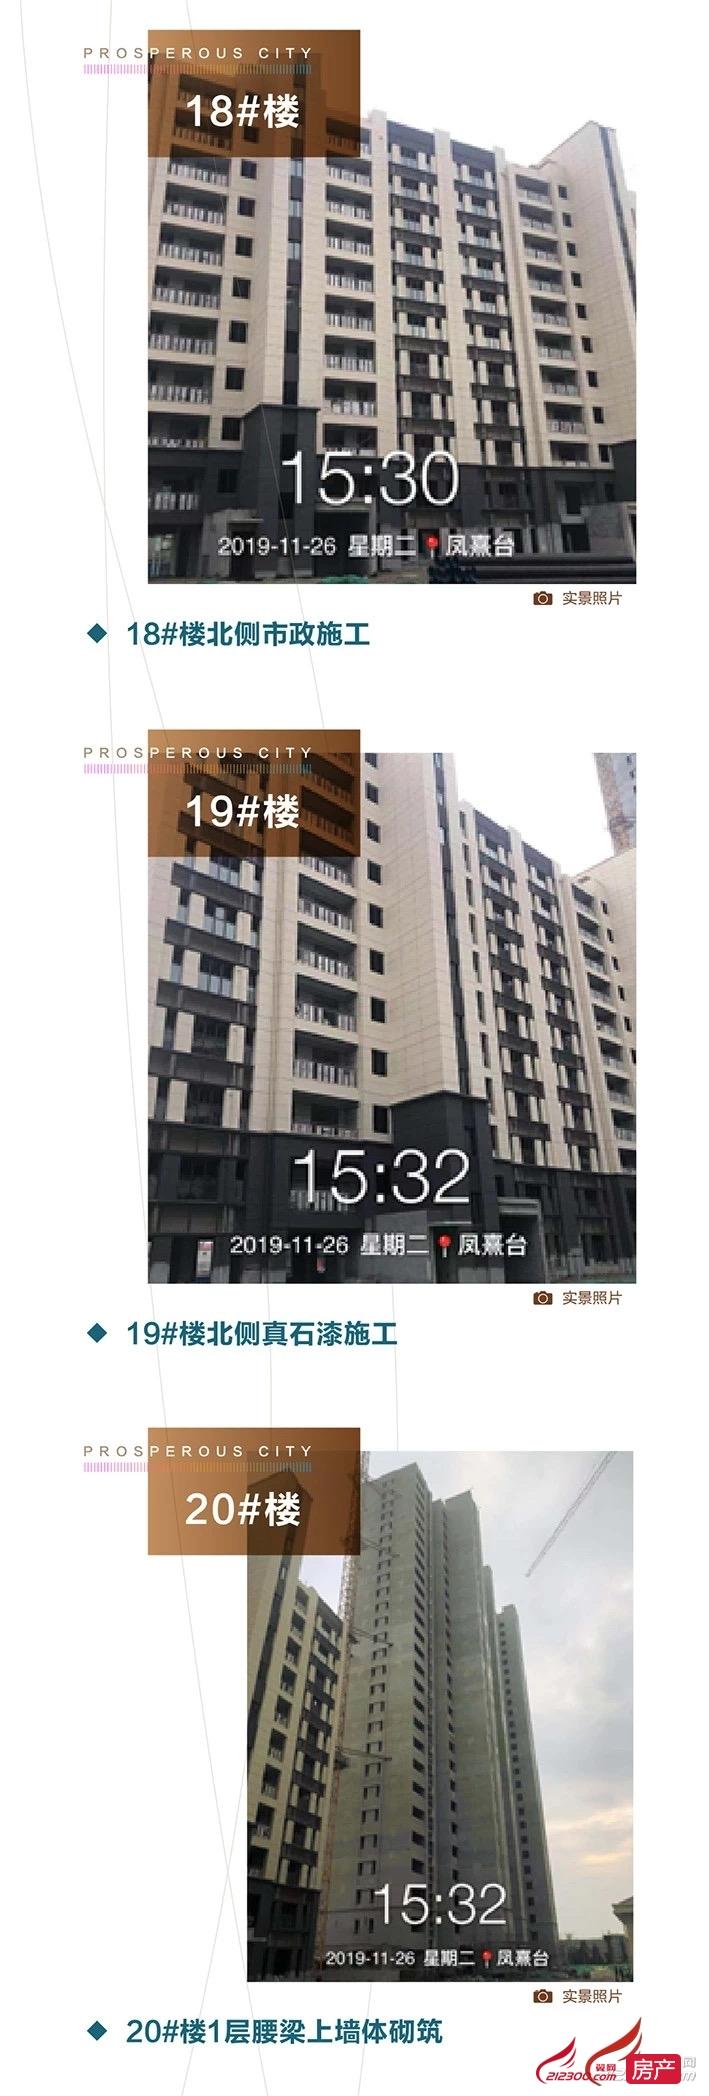 IMG_9193(20191217-102134).JPG